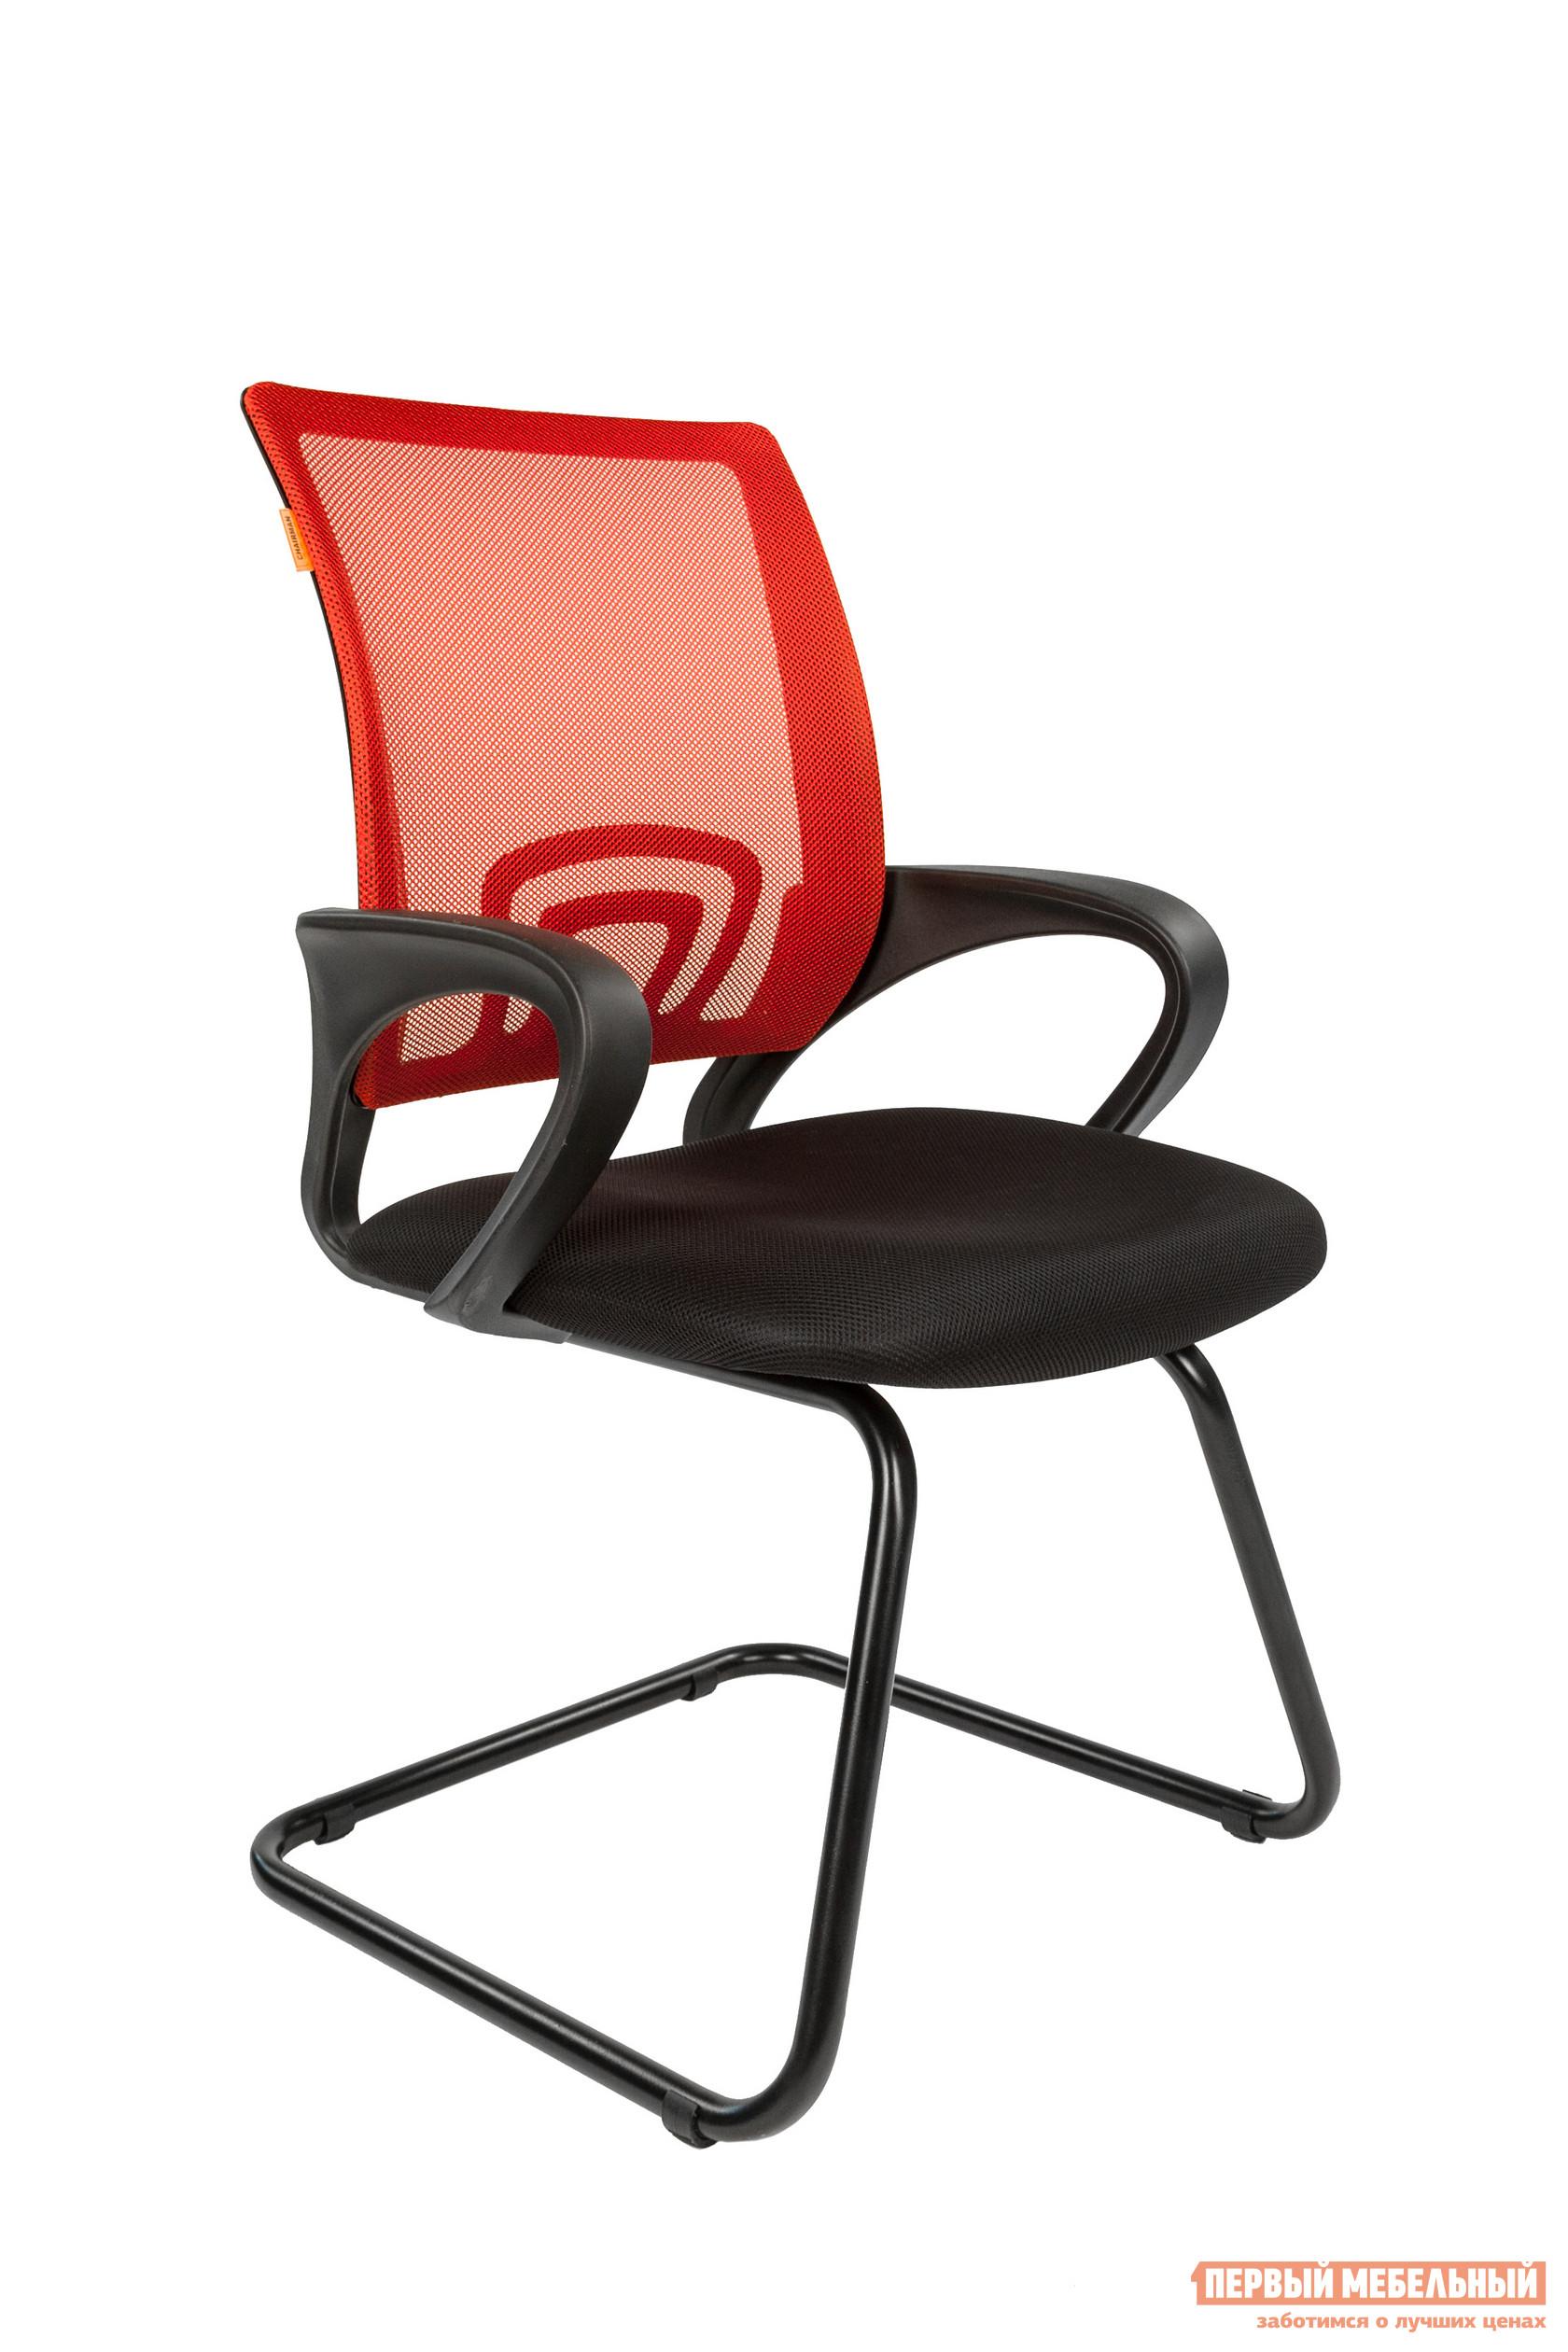 Офисный стул Тайпит Chairman CH 696V стул офисный стандарт 470х560х820мм черный ткань металл